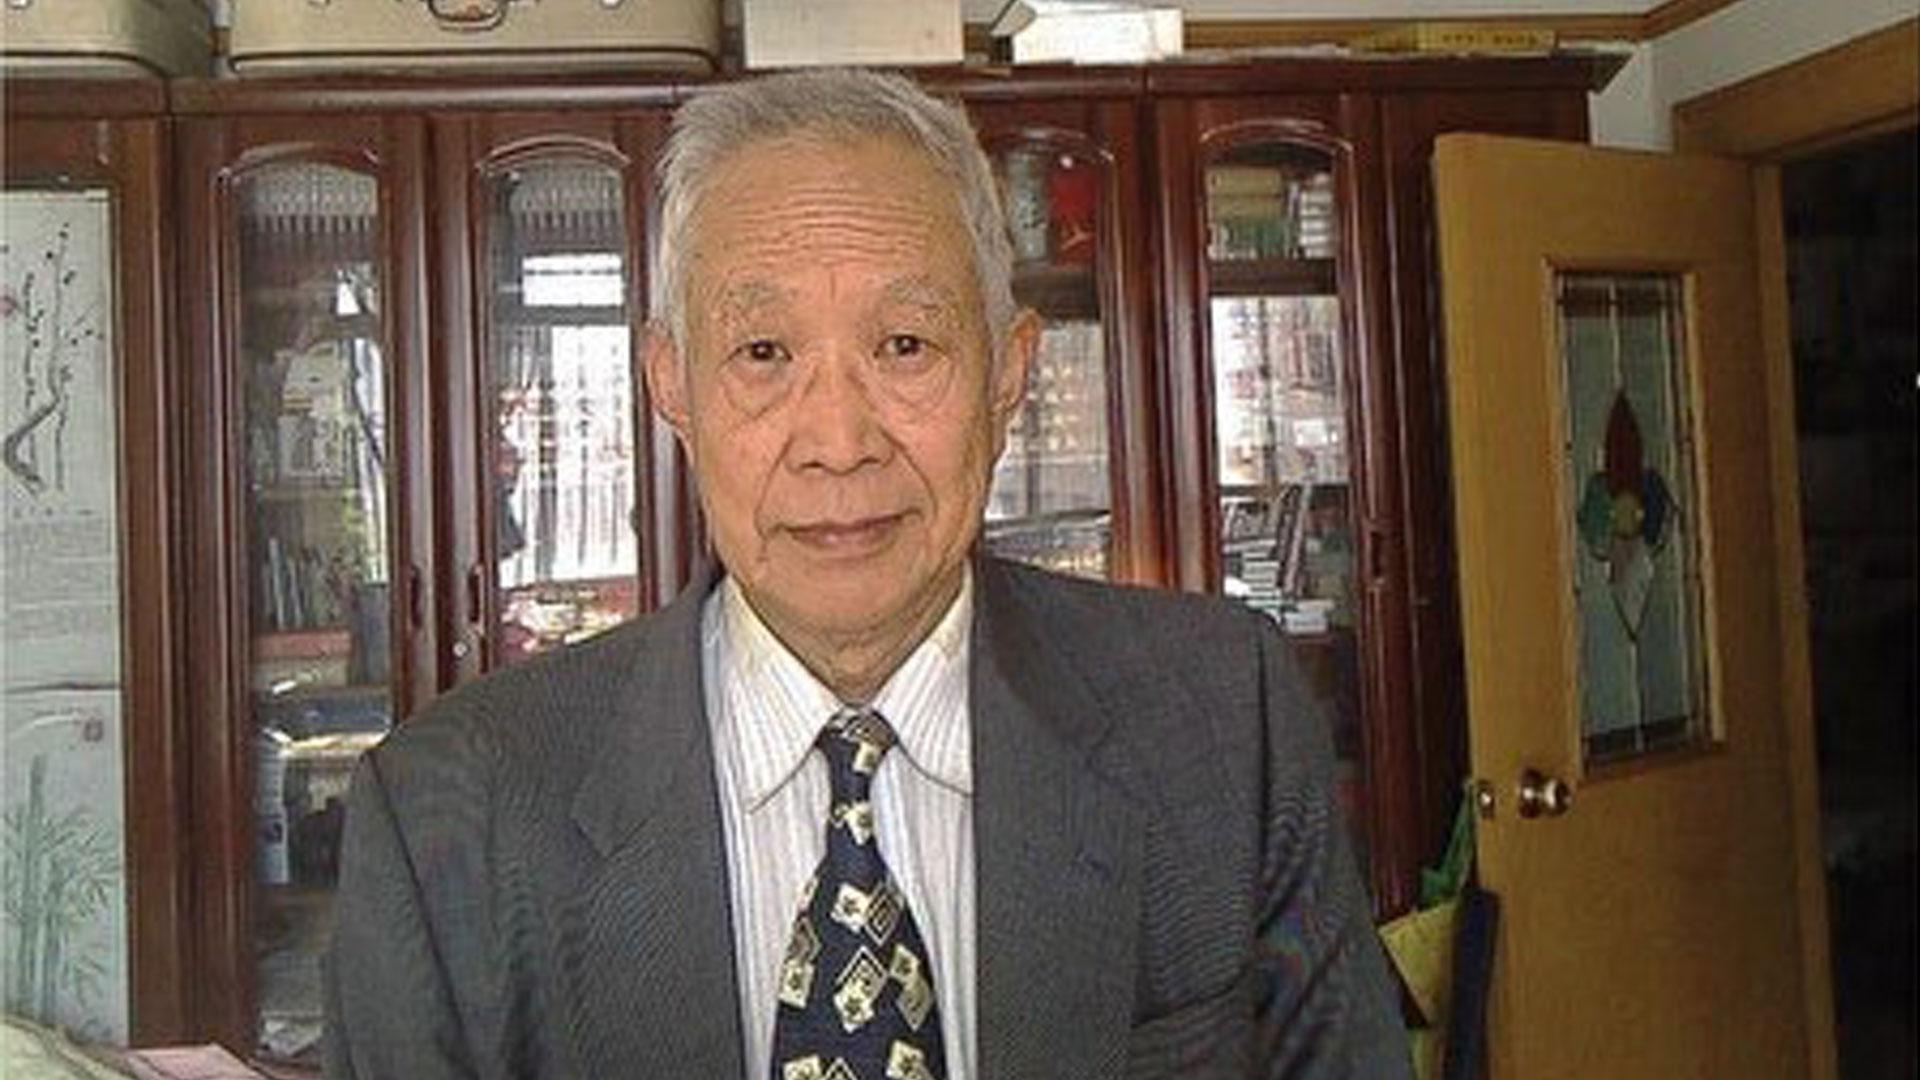 Mantan Dekan Fakultas Politik Renmin University yakni Leng Jiefu pada April tahun ini telah mengirimkan surat terbuka menyerukan Xi Jinping agar mengundurkan diri dari segala jabatannya, sebagai respon terhadap krisis dalam dan luar negeri yang dialami RRT saat ini.